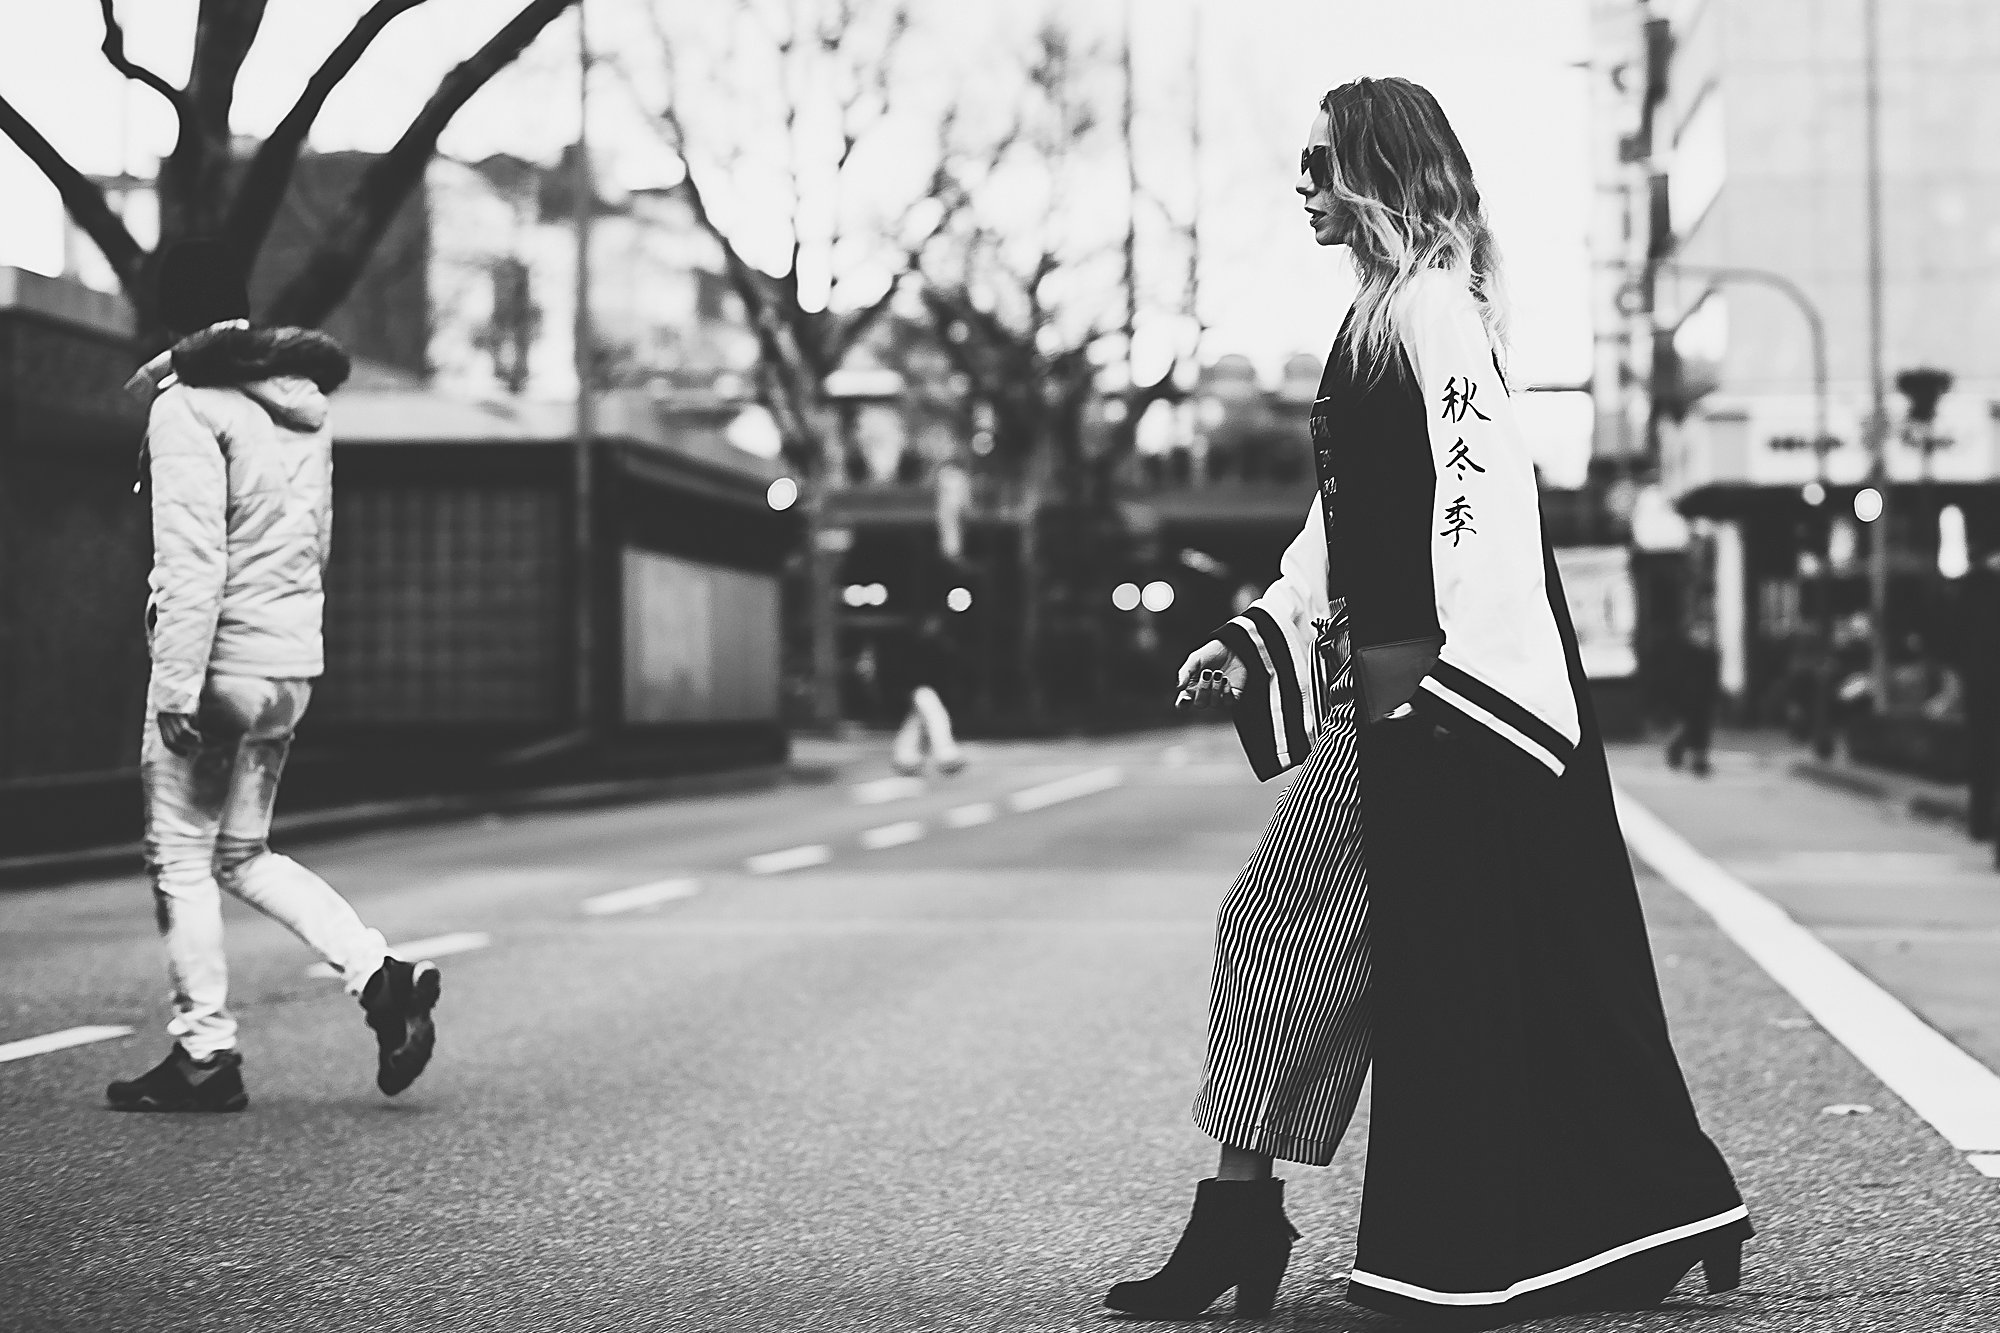 neujahr-minamia-jasmin-kessler-modeblogger-zeitreise-ootd